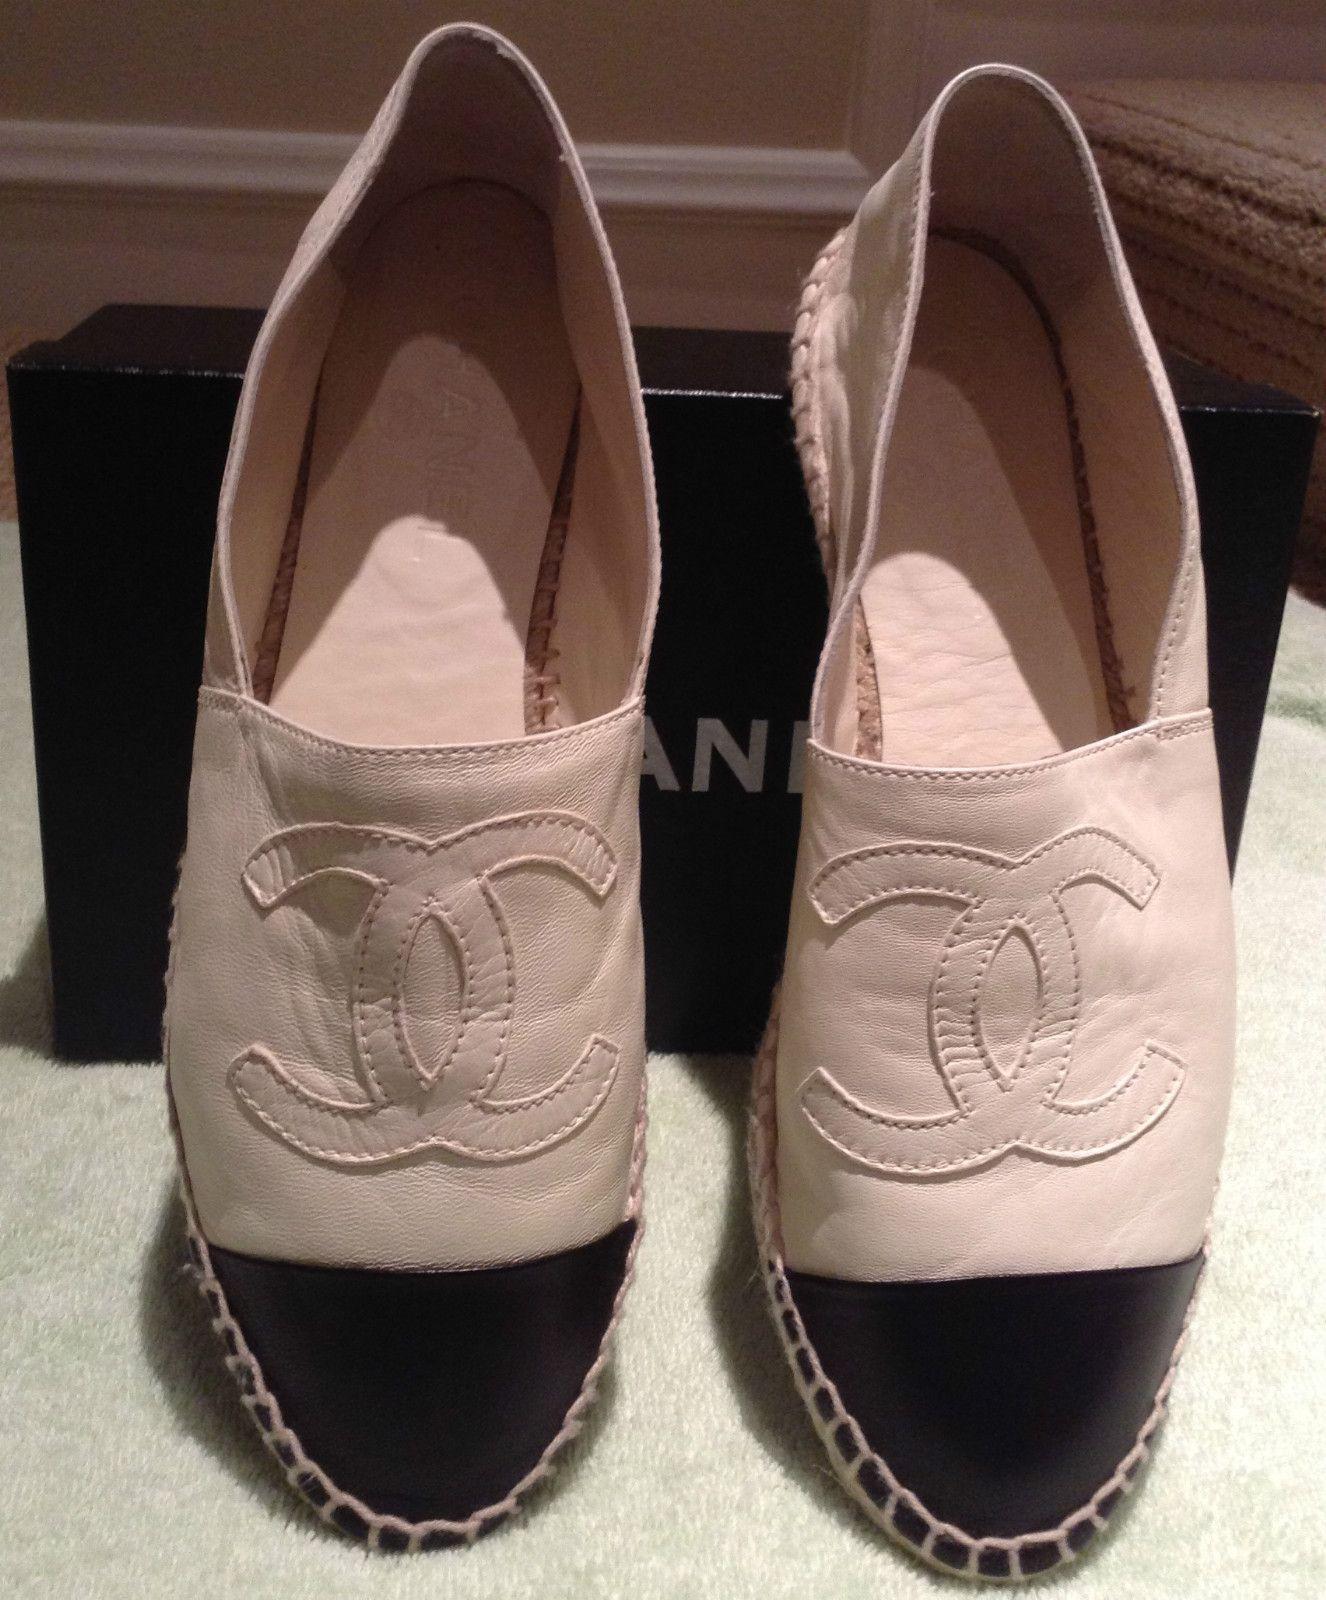 Chanel - Designers